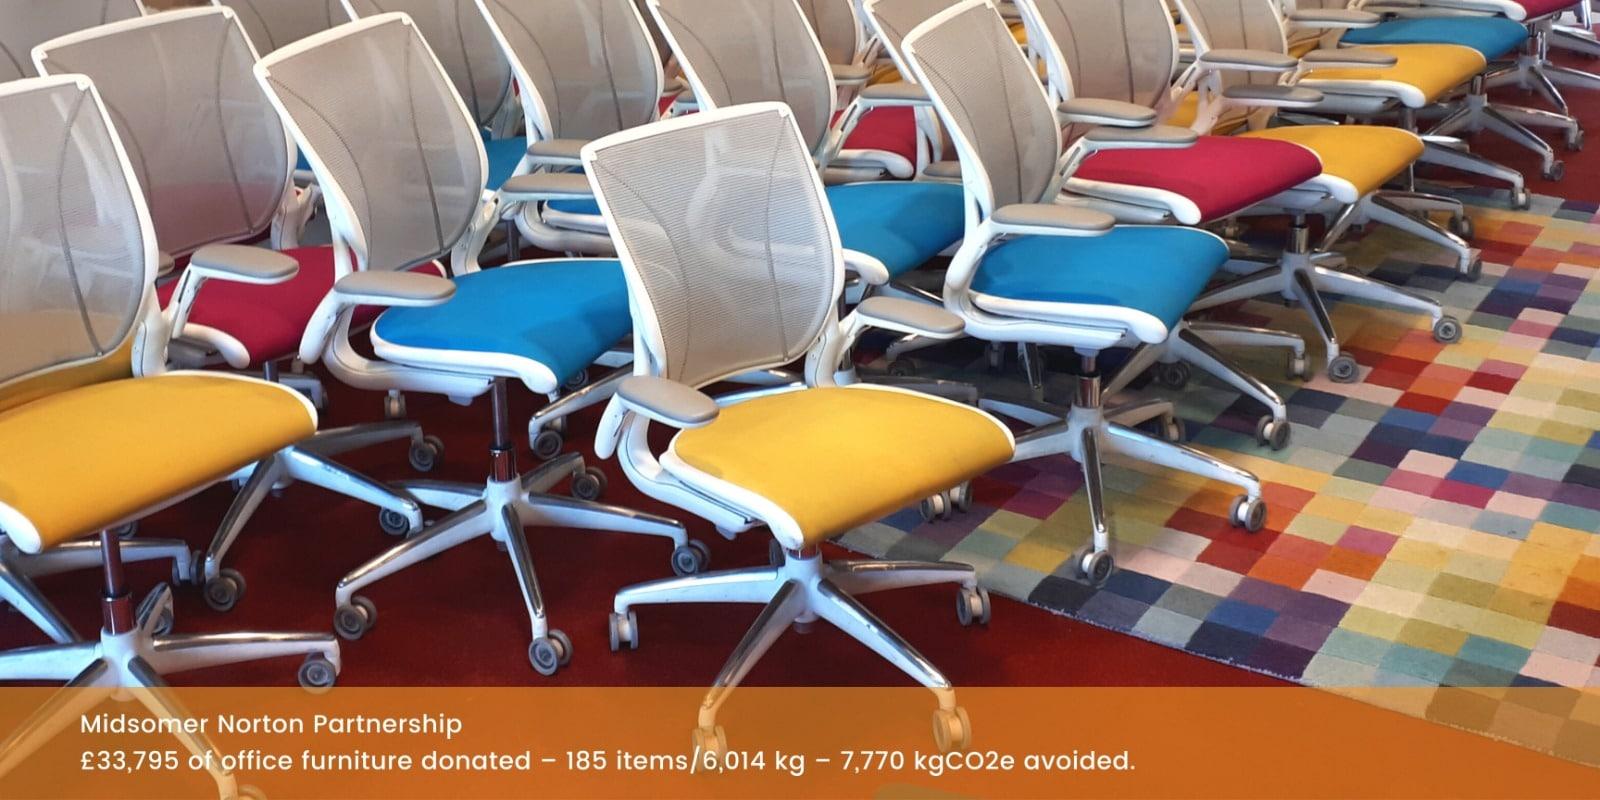 Furniture donated to Midsomer Norton Partnership